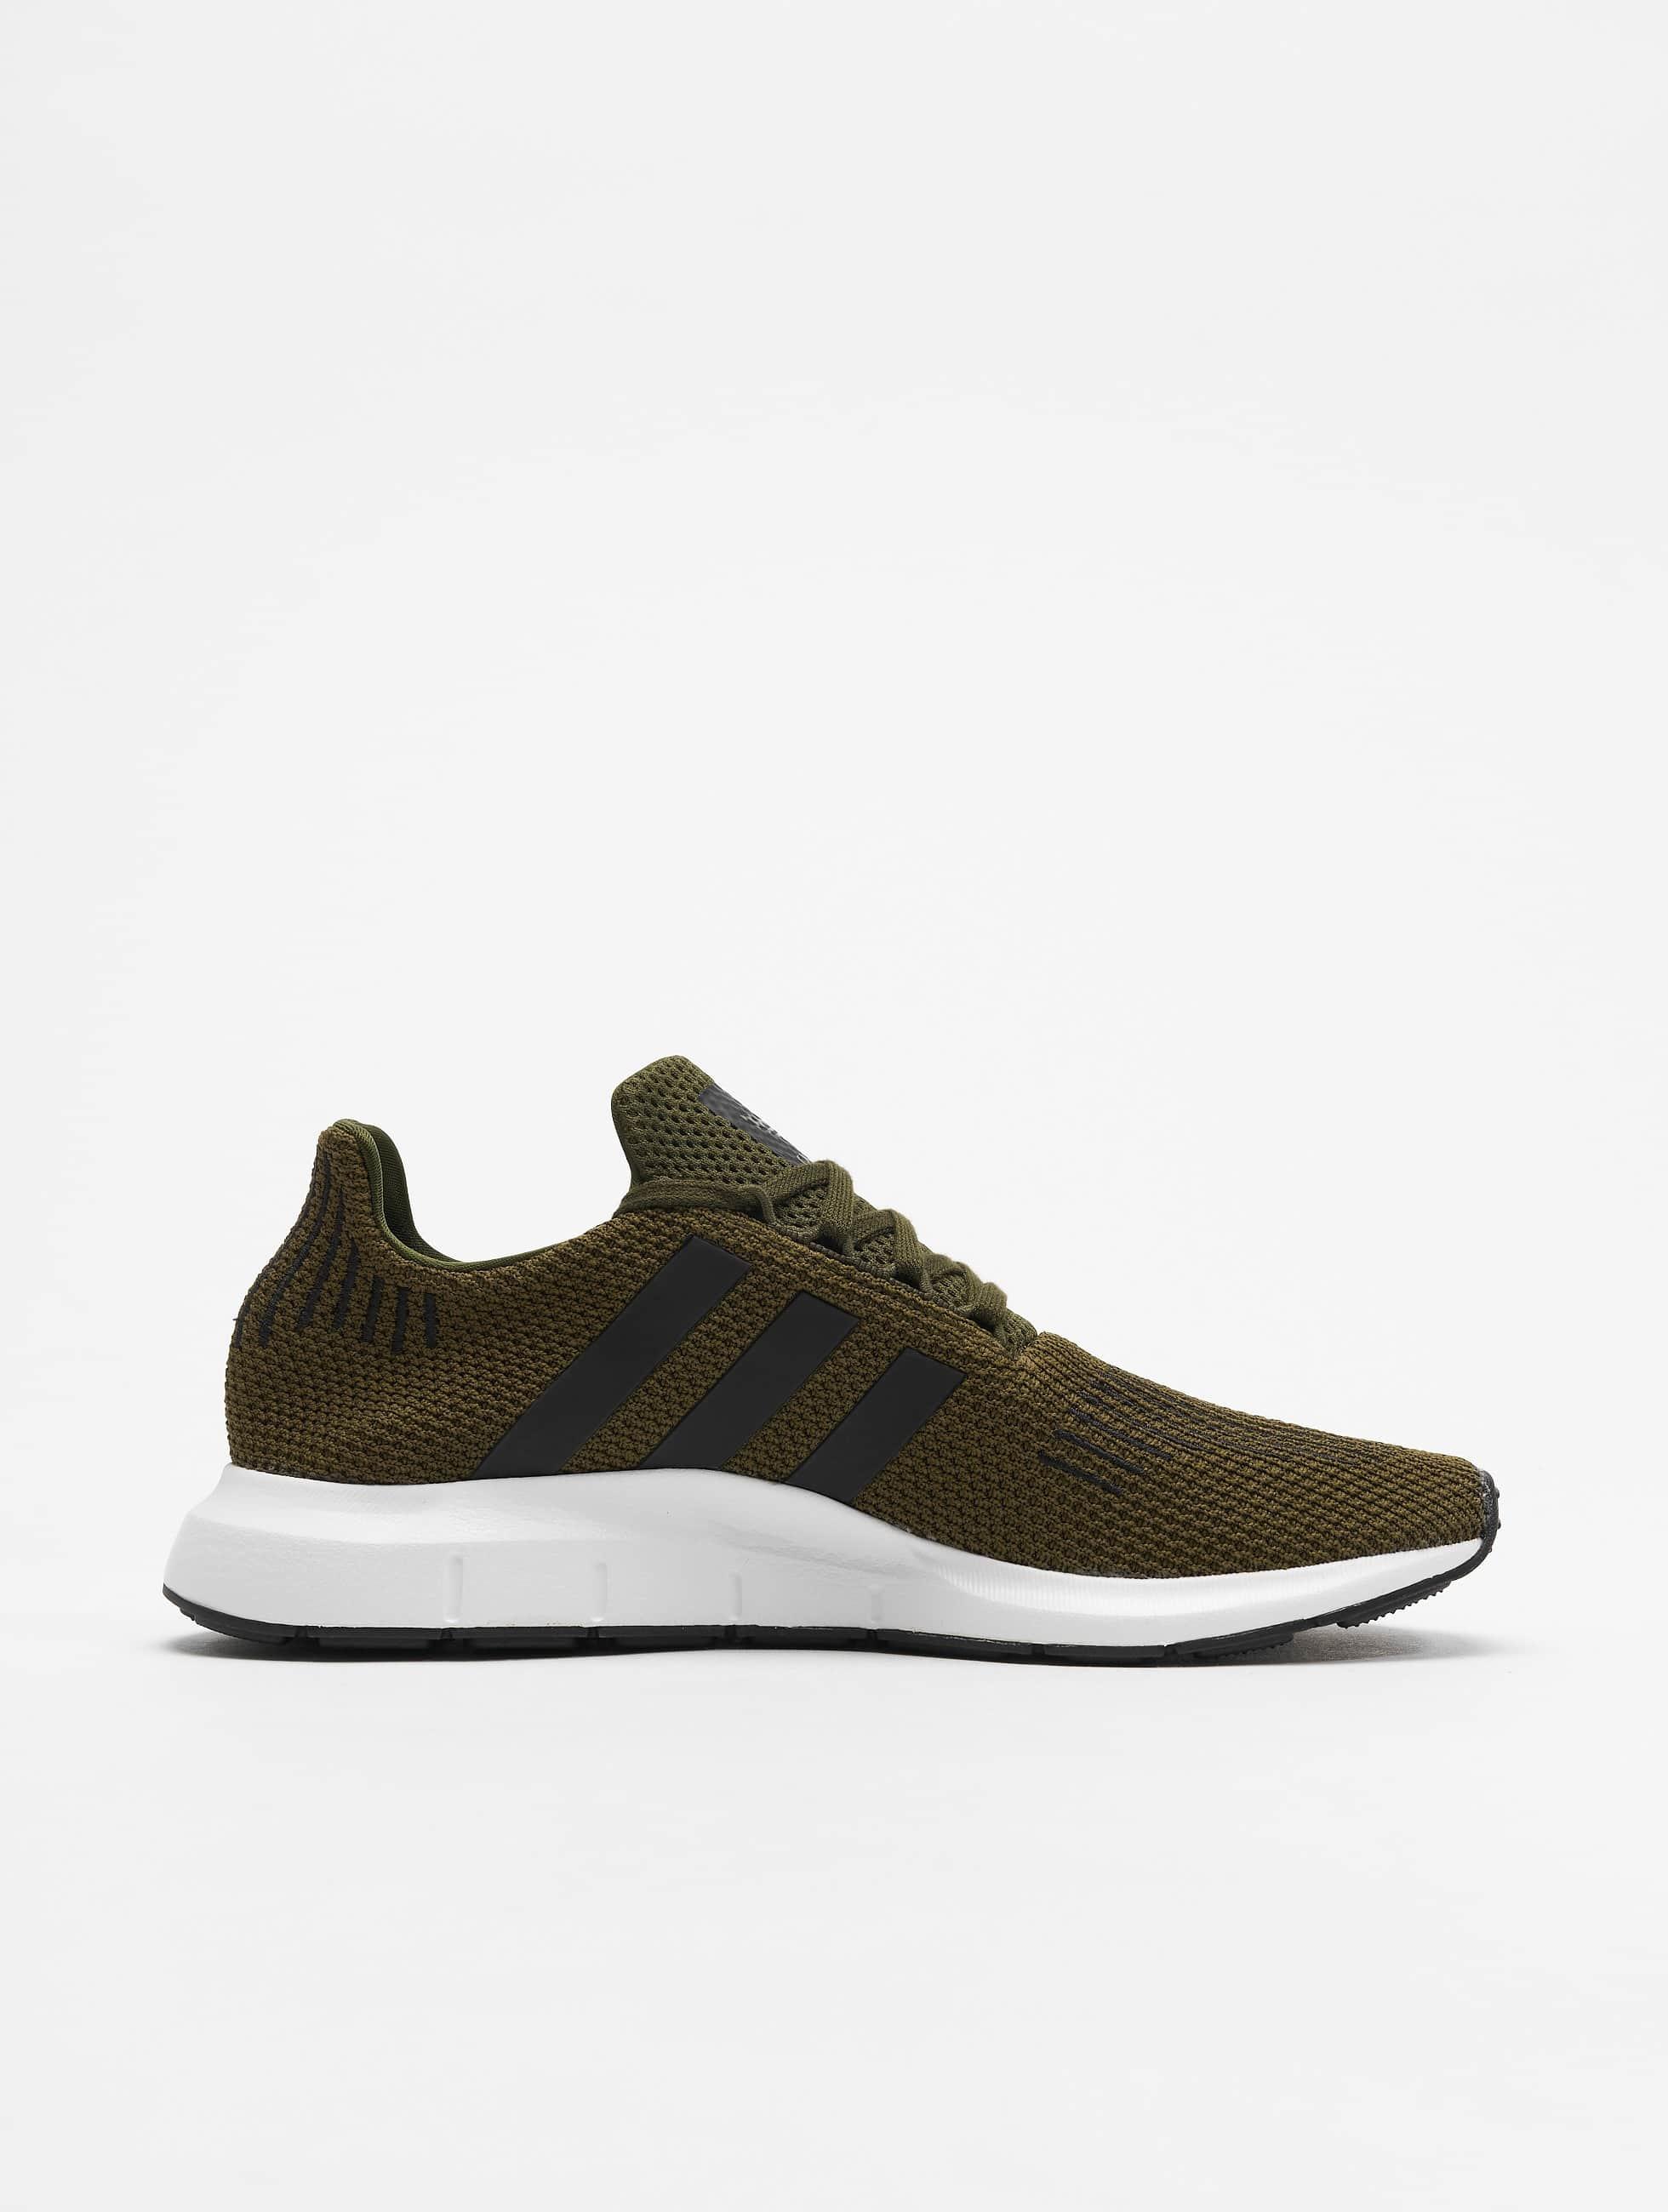 Adidas Adidas Adidas originals Herren Schuhe   Turnschuhe Swift Run 9b1cf5